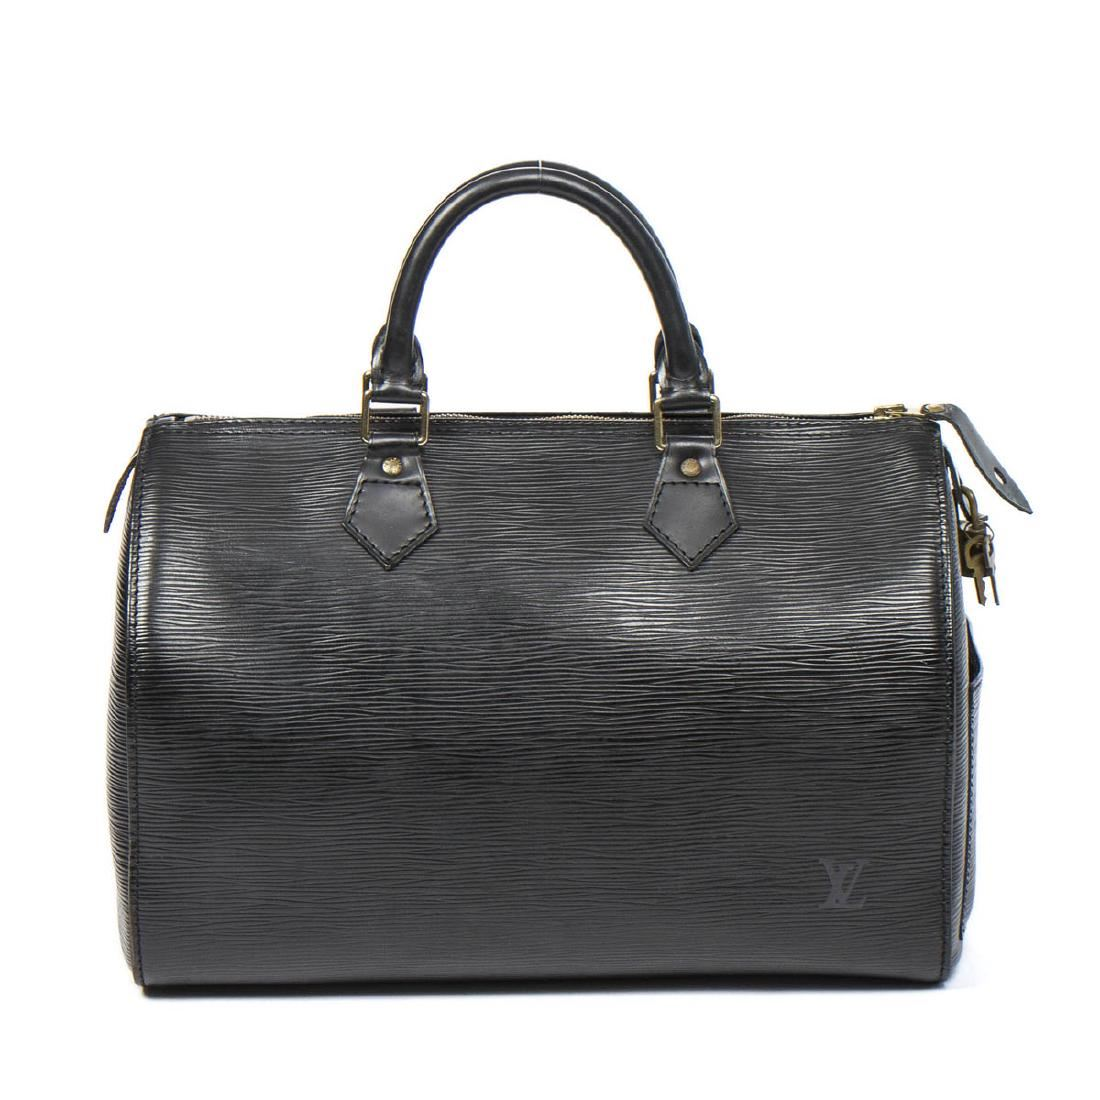 49c58c3ce19e Image 1   Louis Vuitton Speedy 30 in Black Epi ...